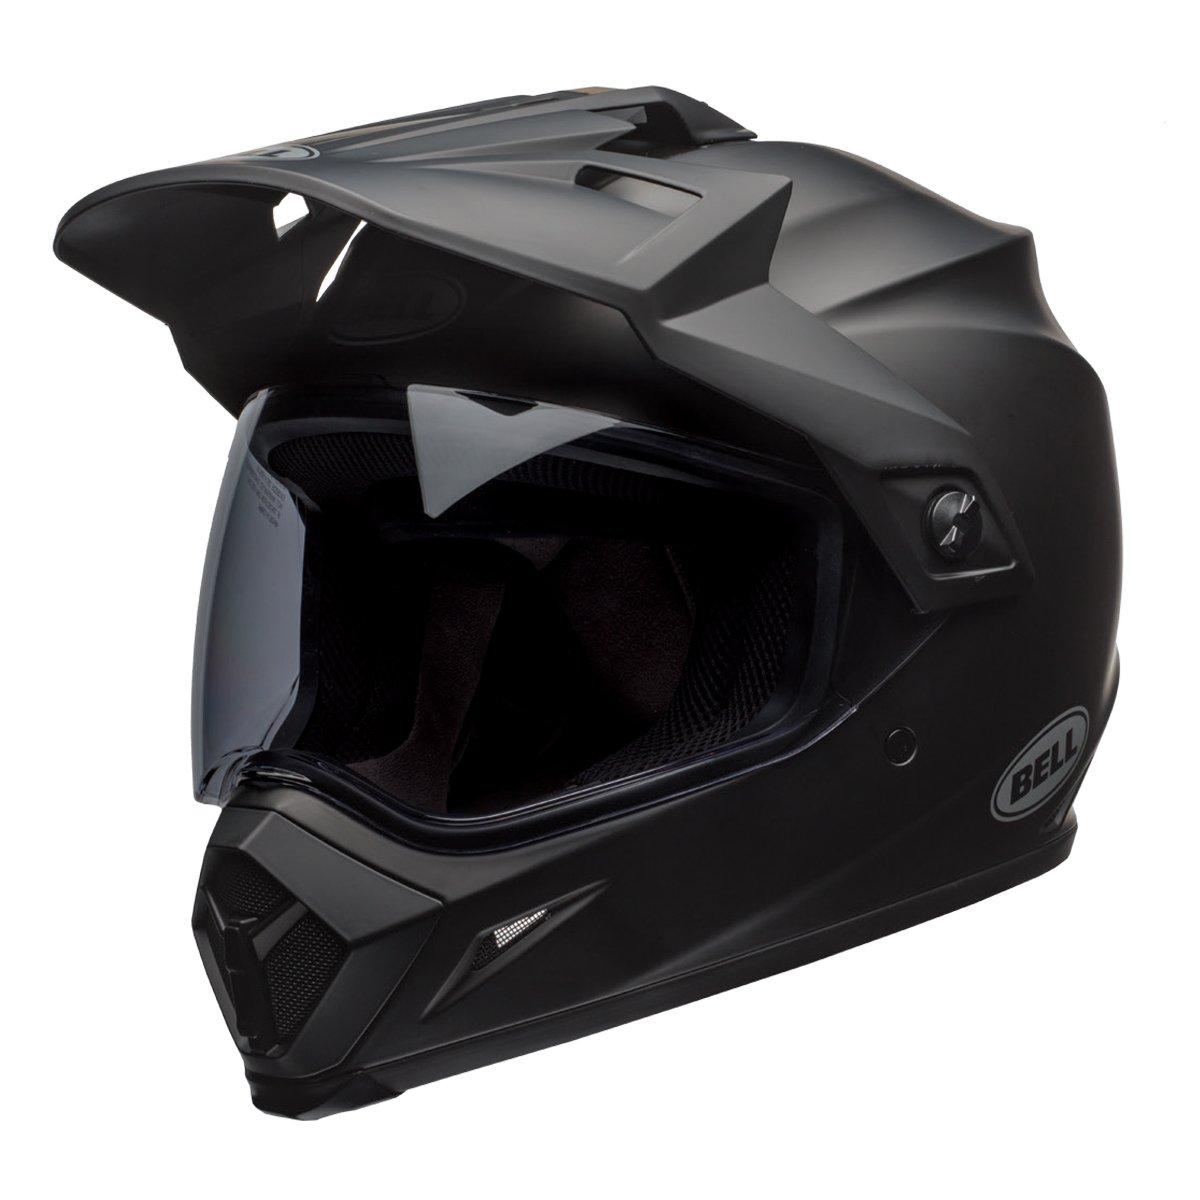 Bell MX-9 Adventure MIPS Full-Face Motorcycle Helmet (Solid Matte Black, Medium)